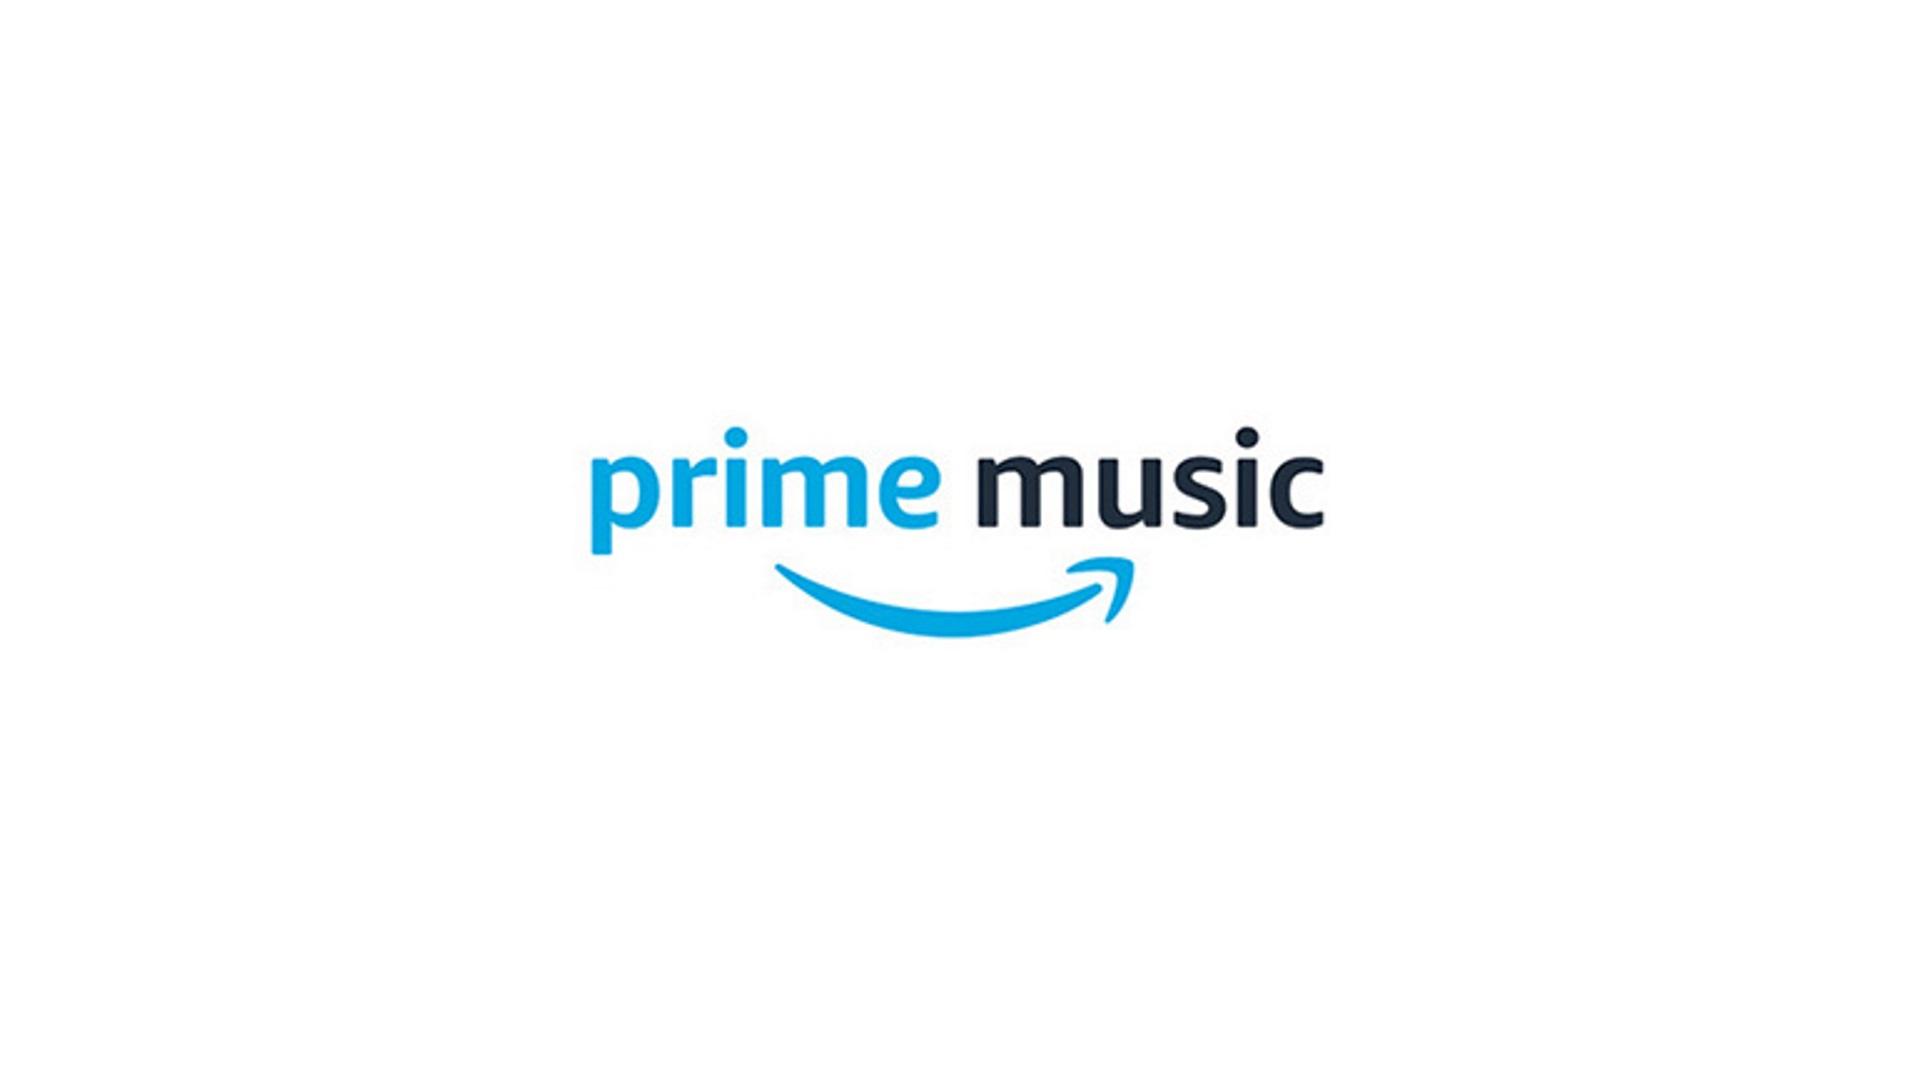 「BIGLOBE SIM」エンタメフリー・オプションにAmazon Musicが追加